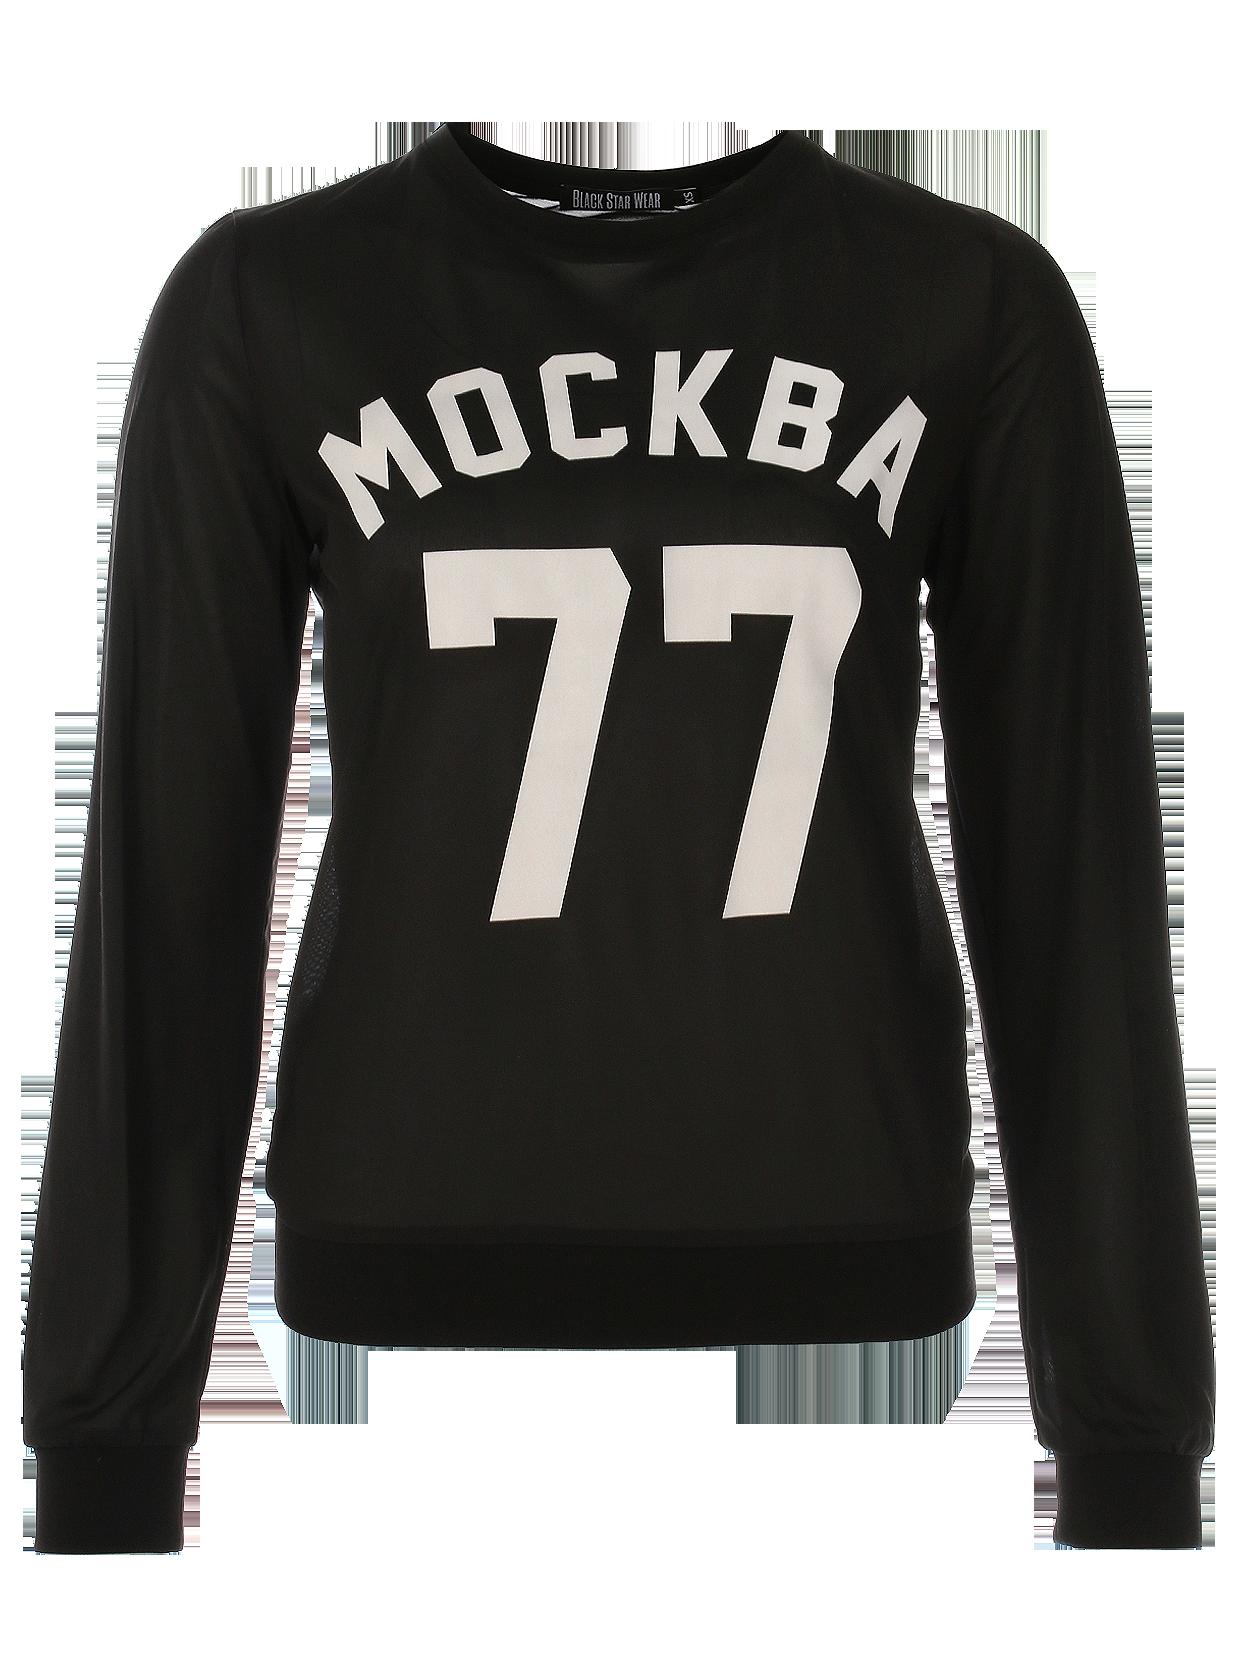 Толстовка женская Москва 77 от Black Star Wear